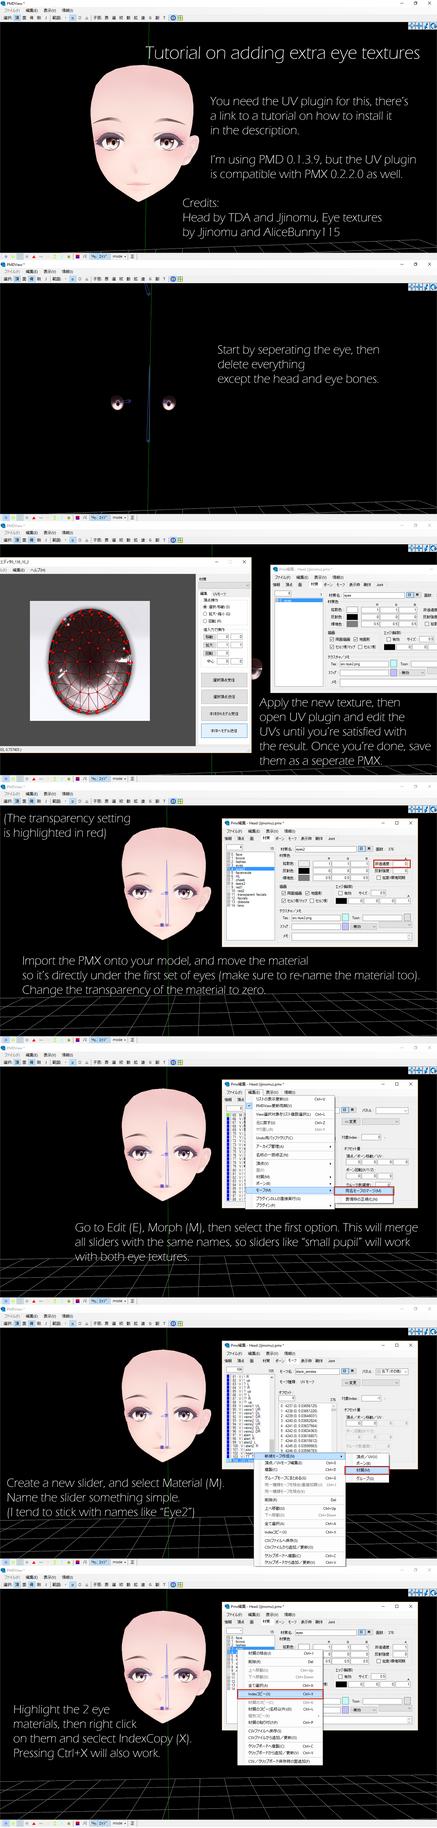 {MMD} Eye Texture Slider Tutorial {Part 1} by HarukaSakurai